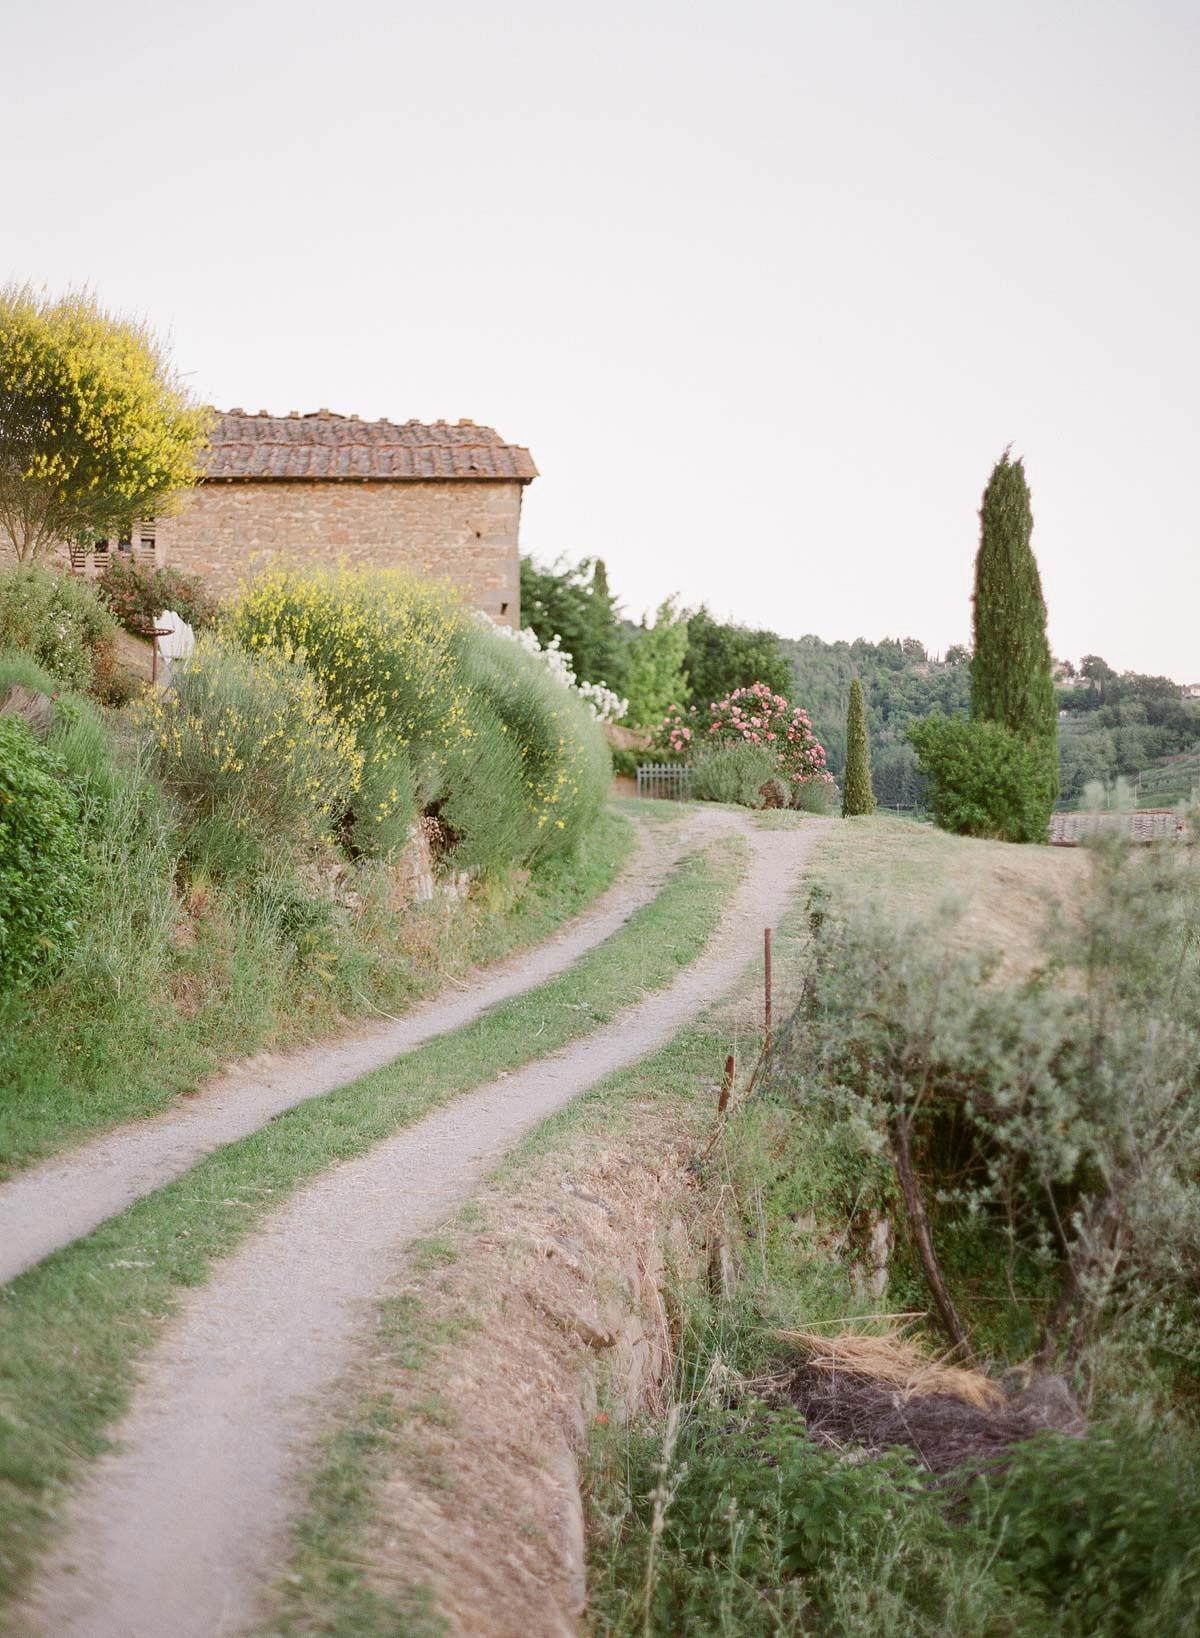 Tuscany in the Summer: Superbly Romantic Honeymoon Spot